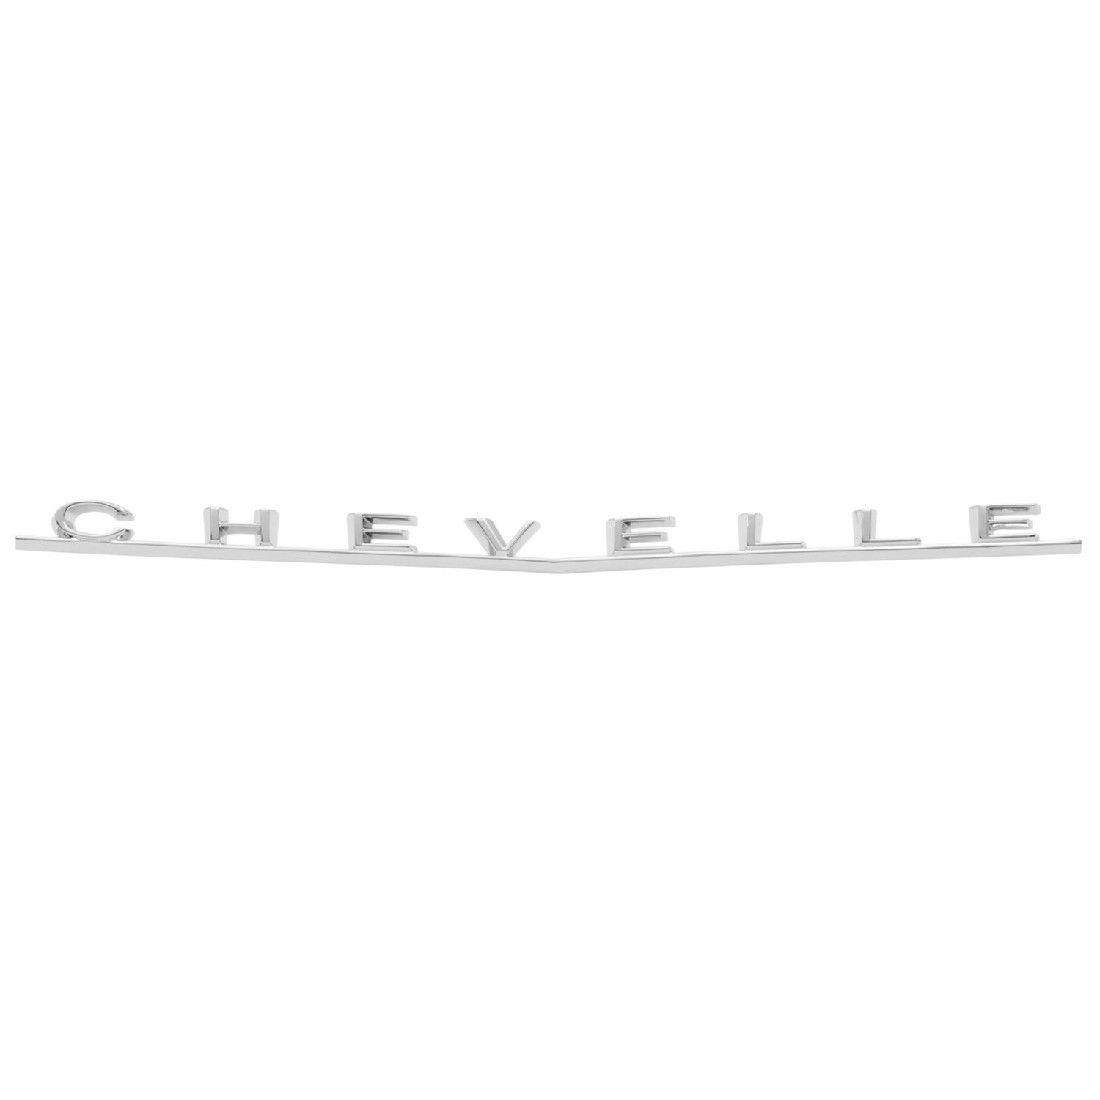 1966 Chevelle Rear Trunk lid Emblem